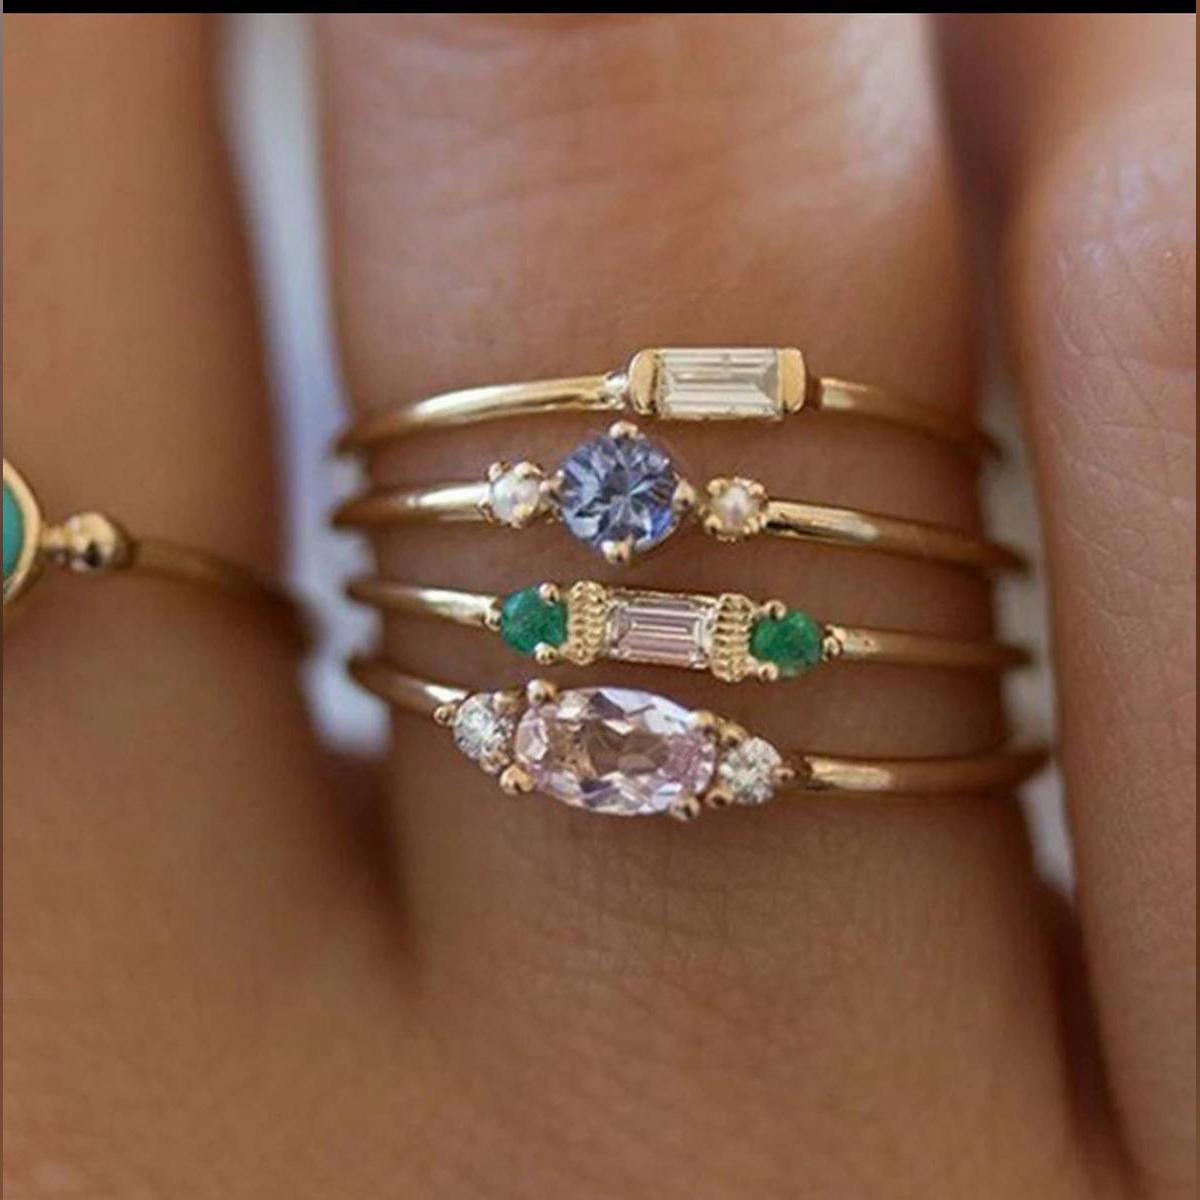 4 Pcs/set Crystal Zircon Gold Ring- Set 2019 -Vintage Bohemian -Women Engagement Party Ring -Set Jewelry